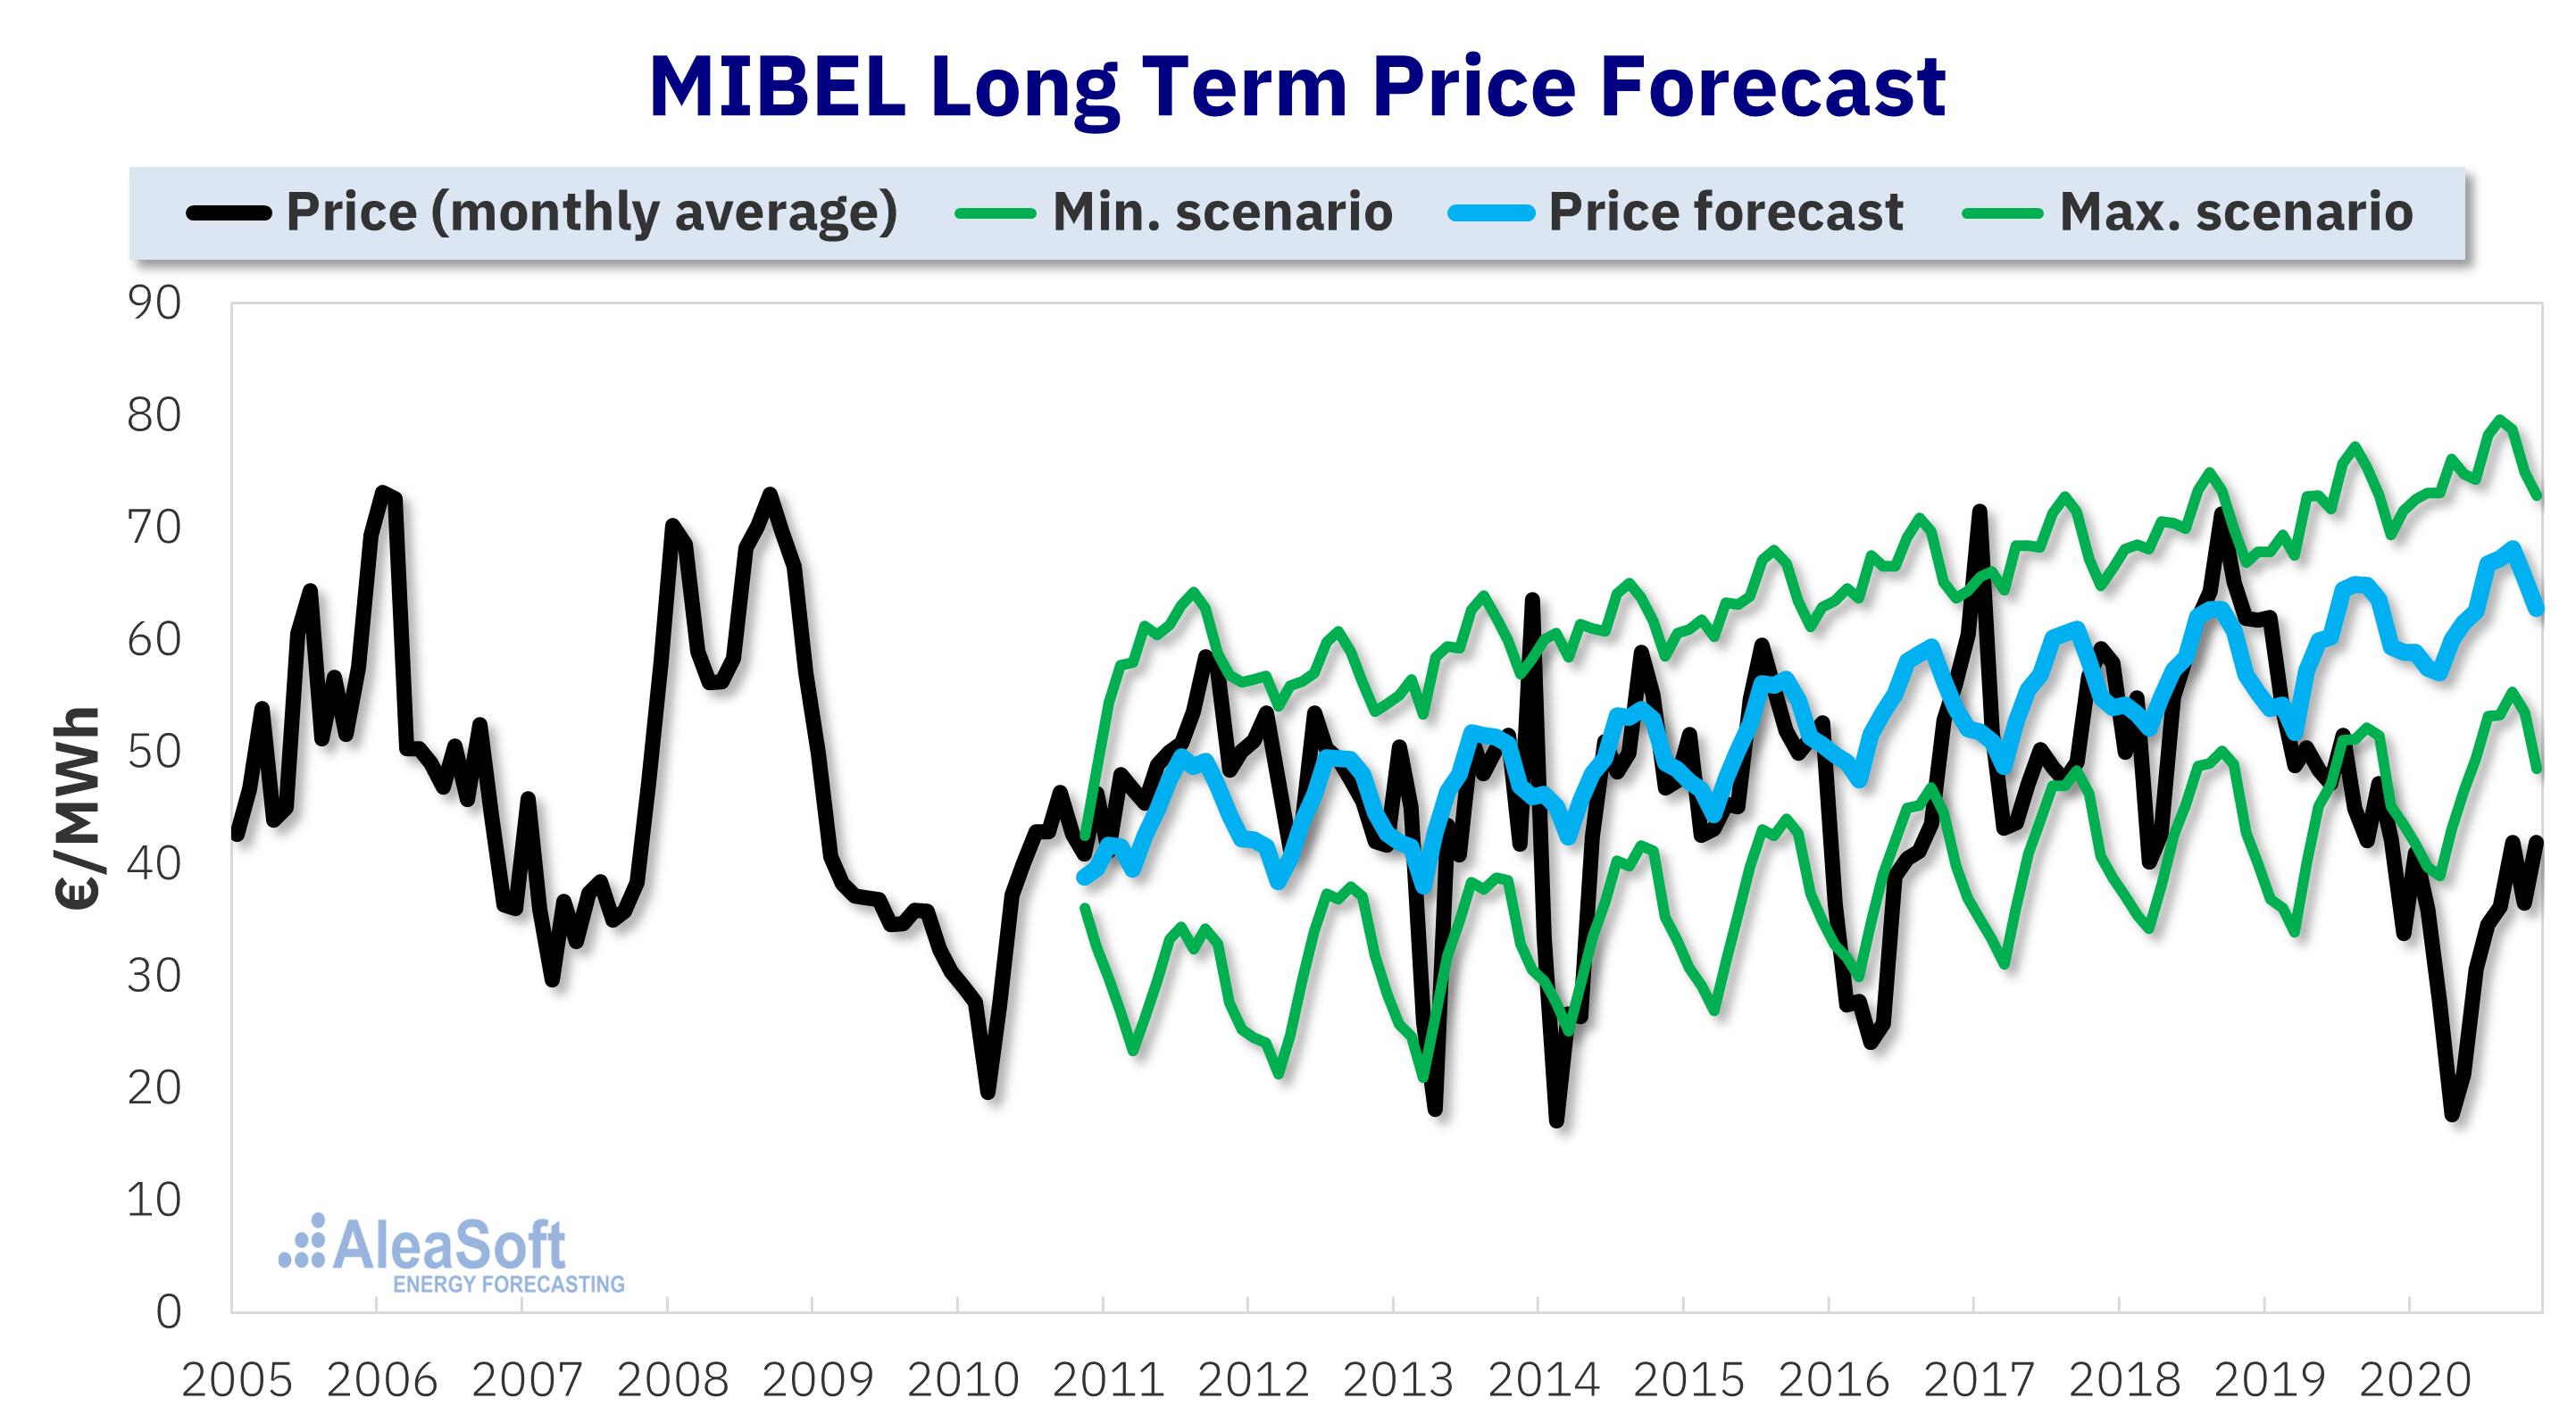 AleaSoft - MIBEL price forecasting 15 years ahead